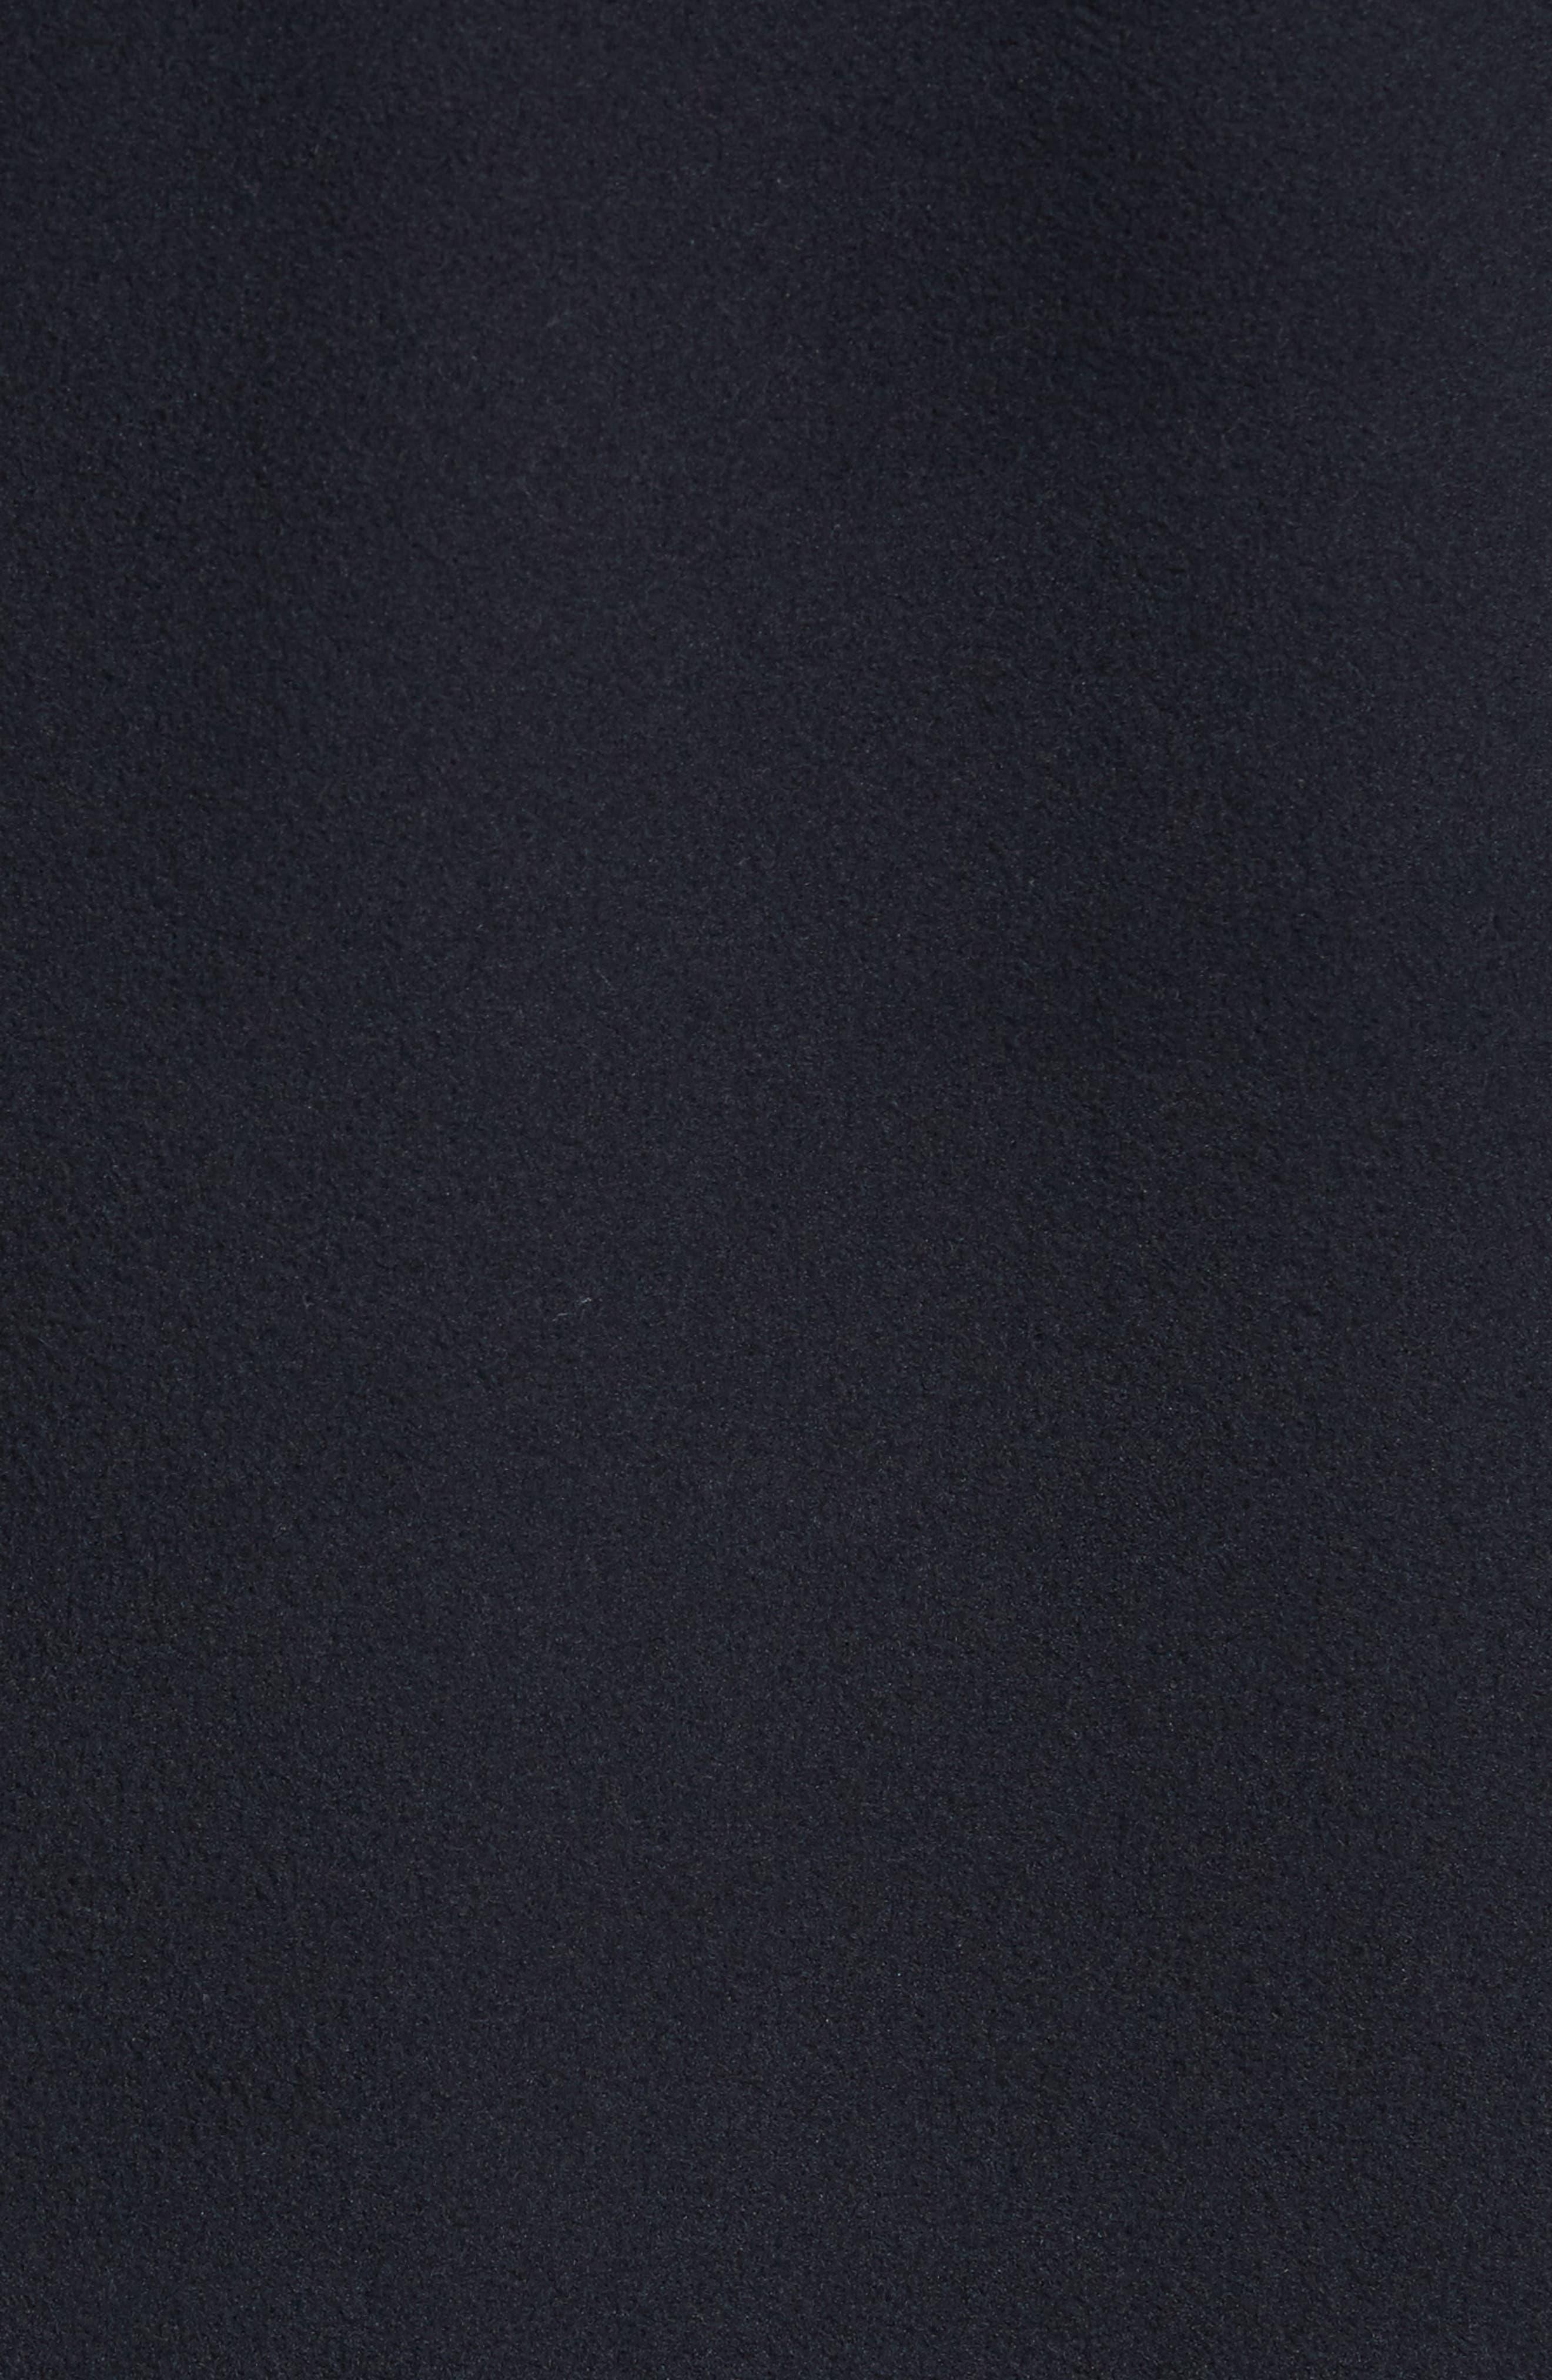 Quarter Zip Fleece Pullover,                             Alternate thumbnail 5, color,                             001